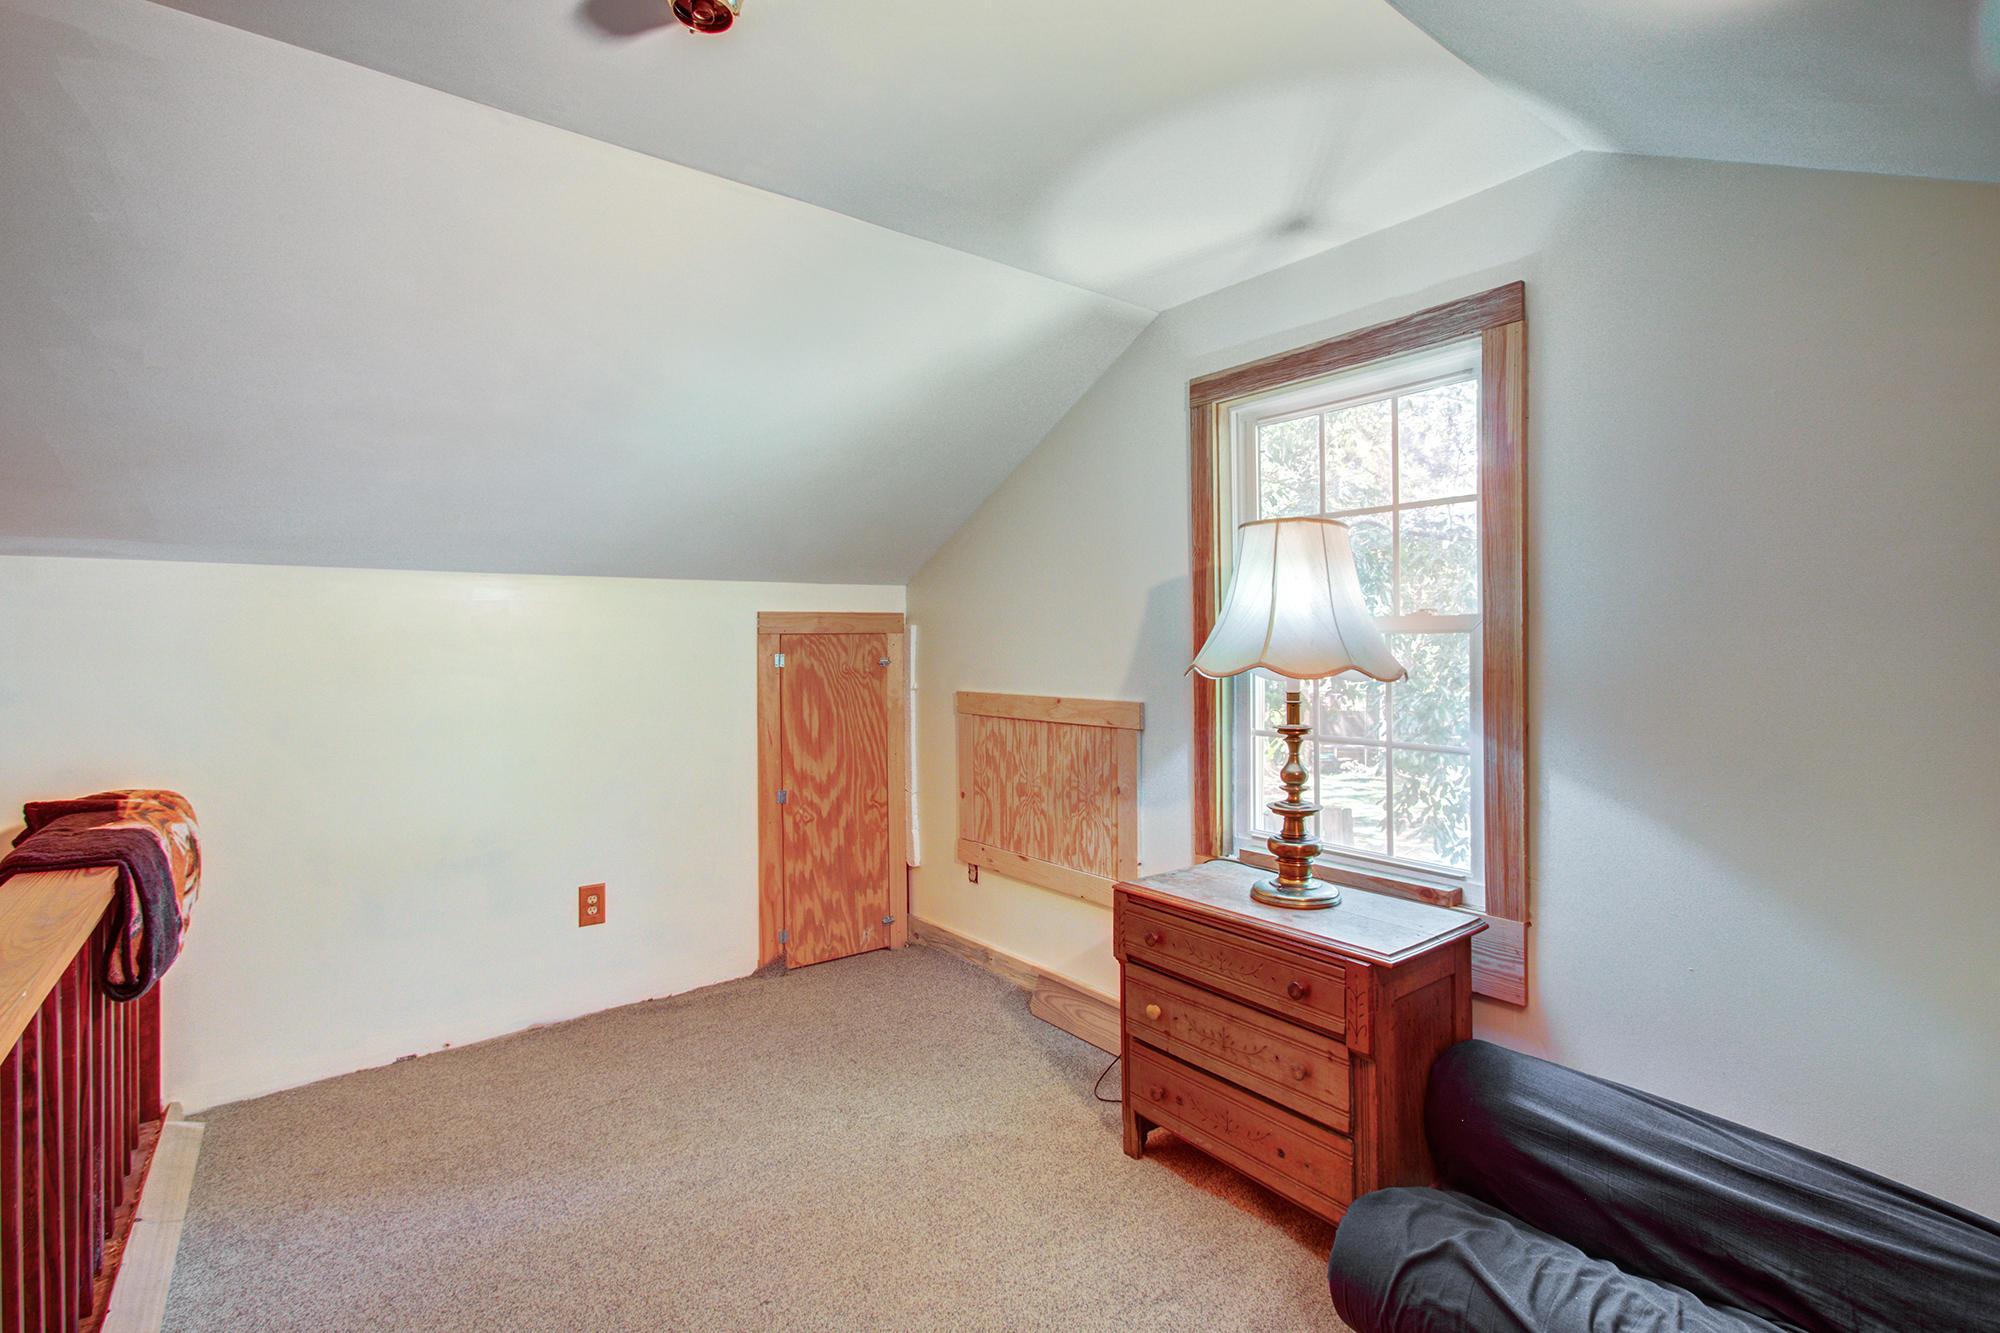 Wando Lakes Homes For Sale - 858 Fairlawn, Mount Pleasant, SC - 17